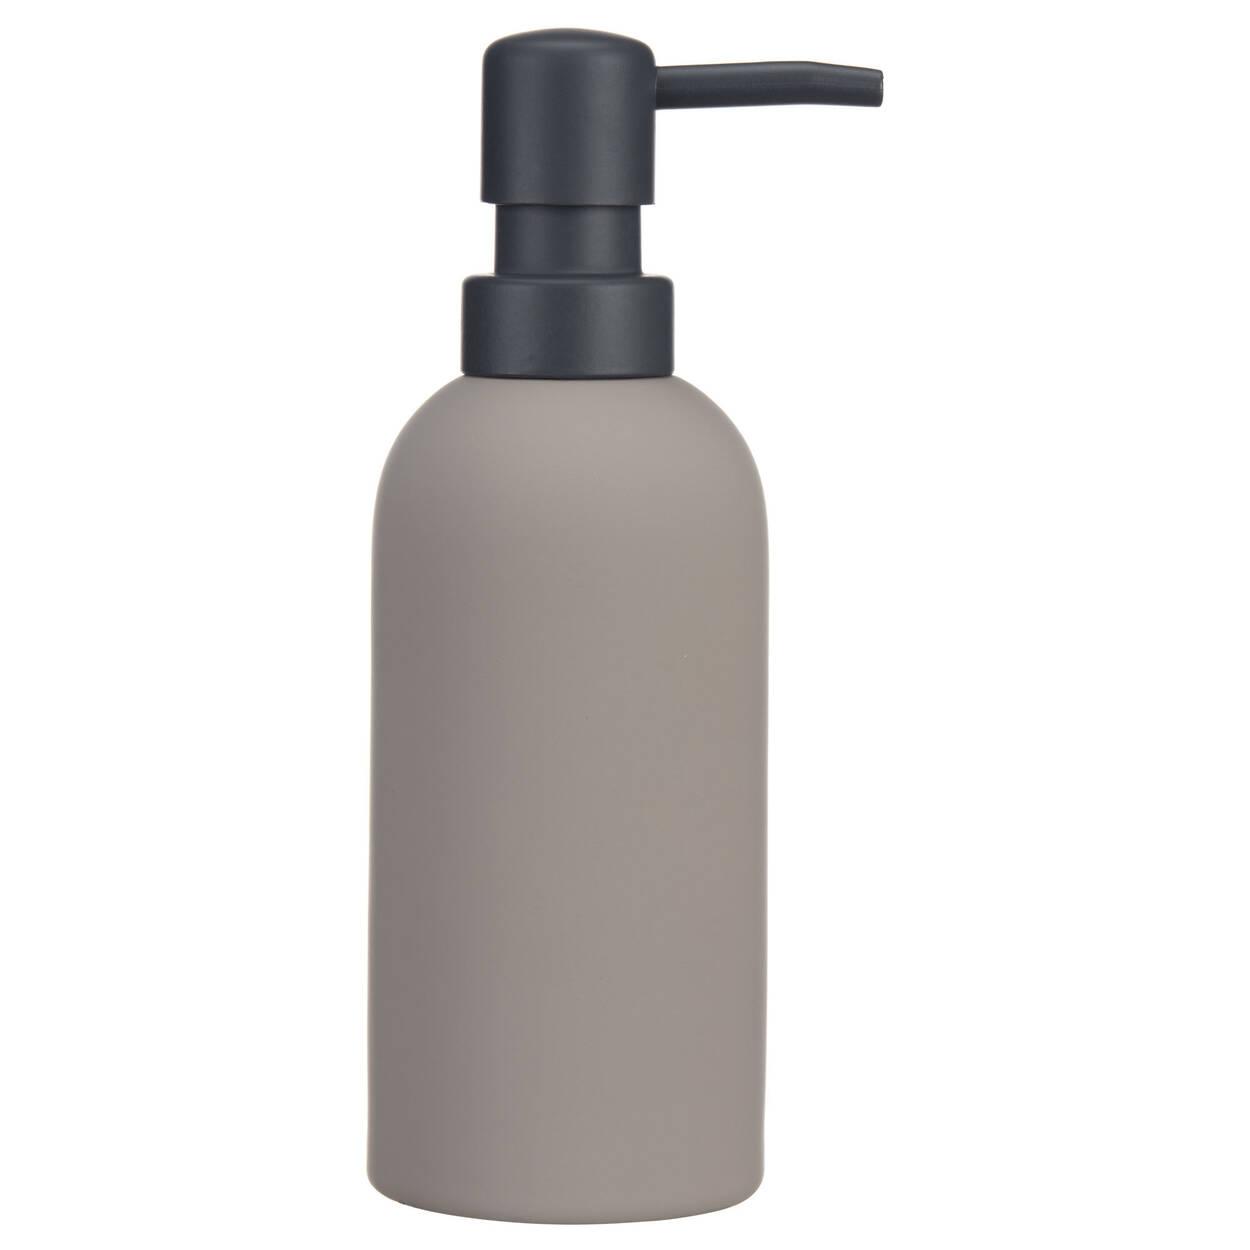 Rubber Coated Soap Dispenser